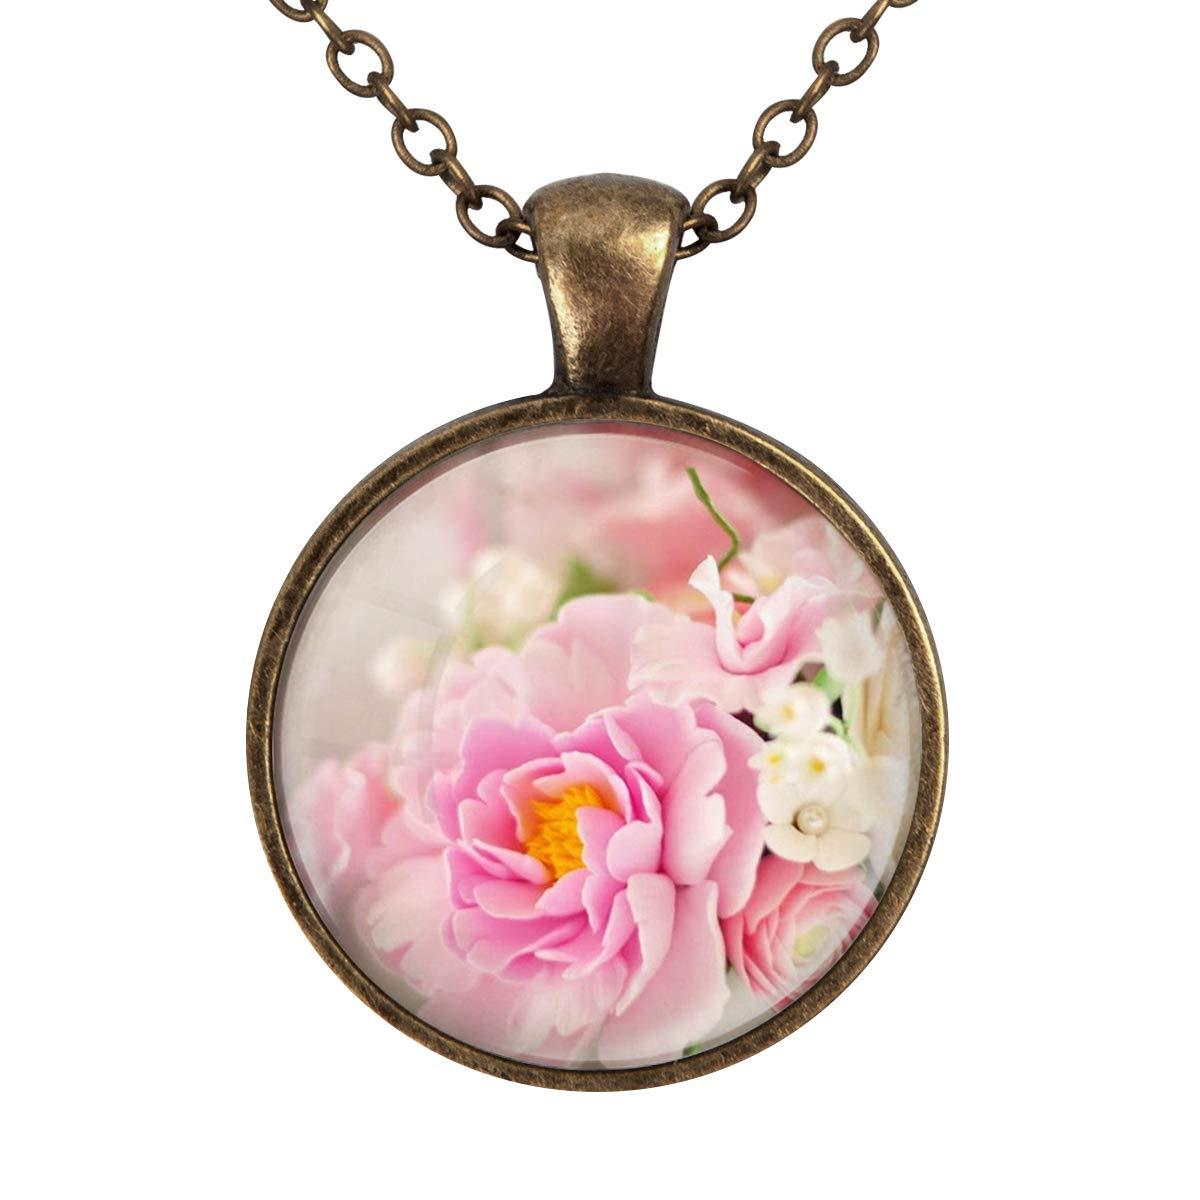 Lightrain Pink Art Flower Pendant Necklace Vintage Bronze Chain Statement Necklace Handmade Jewelry Gifts